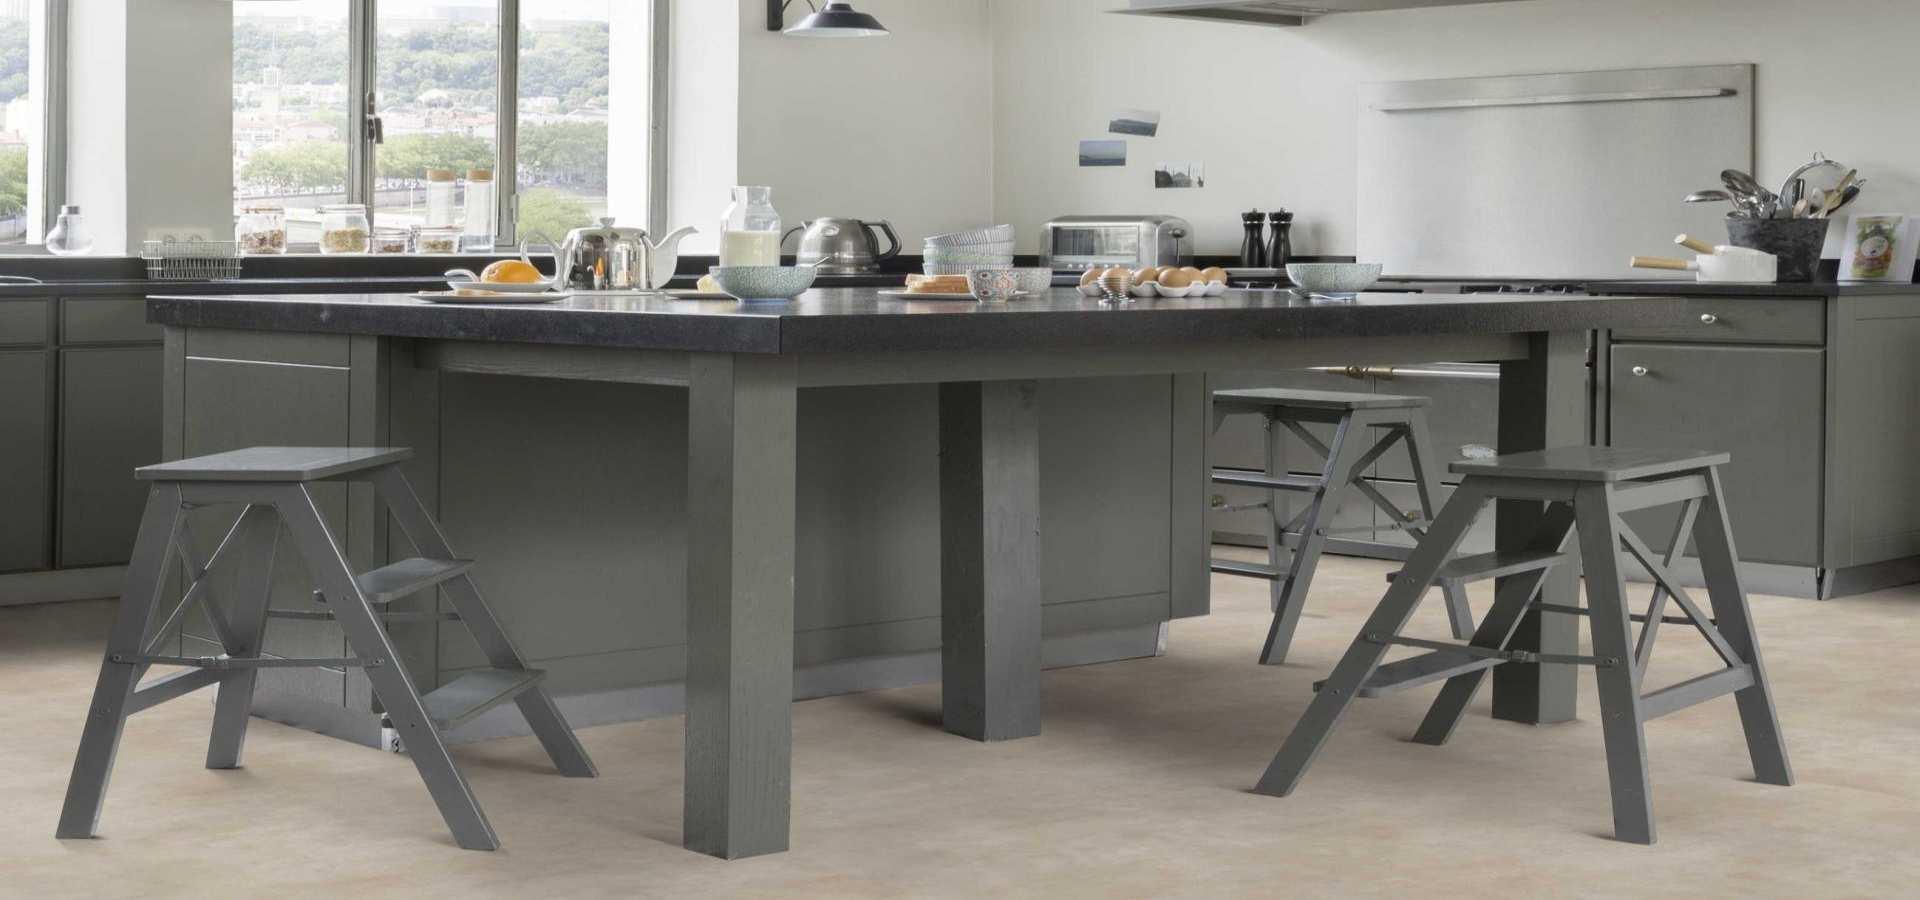 Bild Küche CV Belag Marmor beige